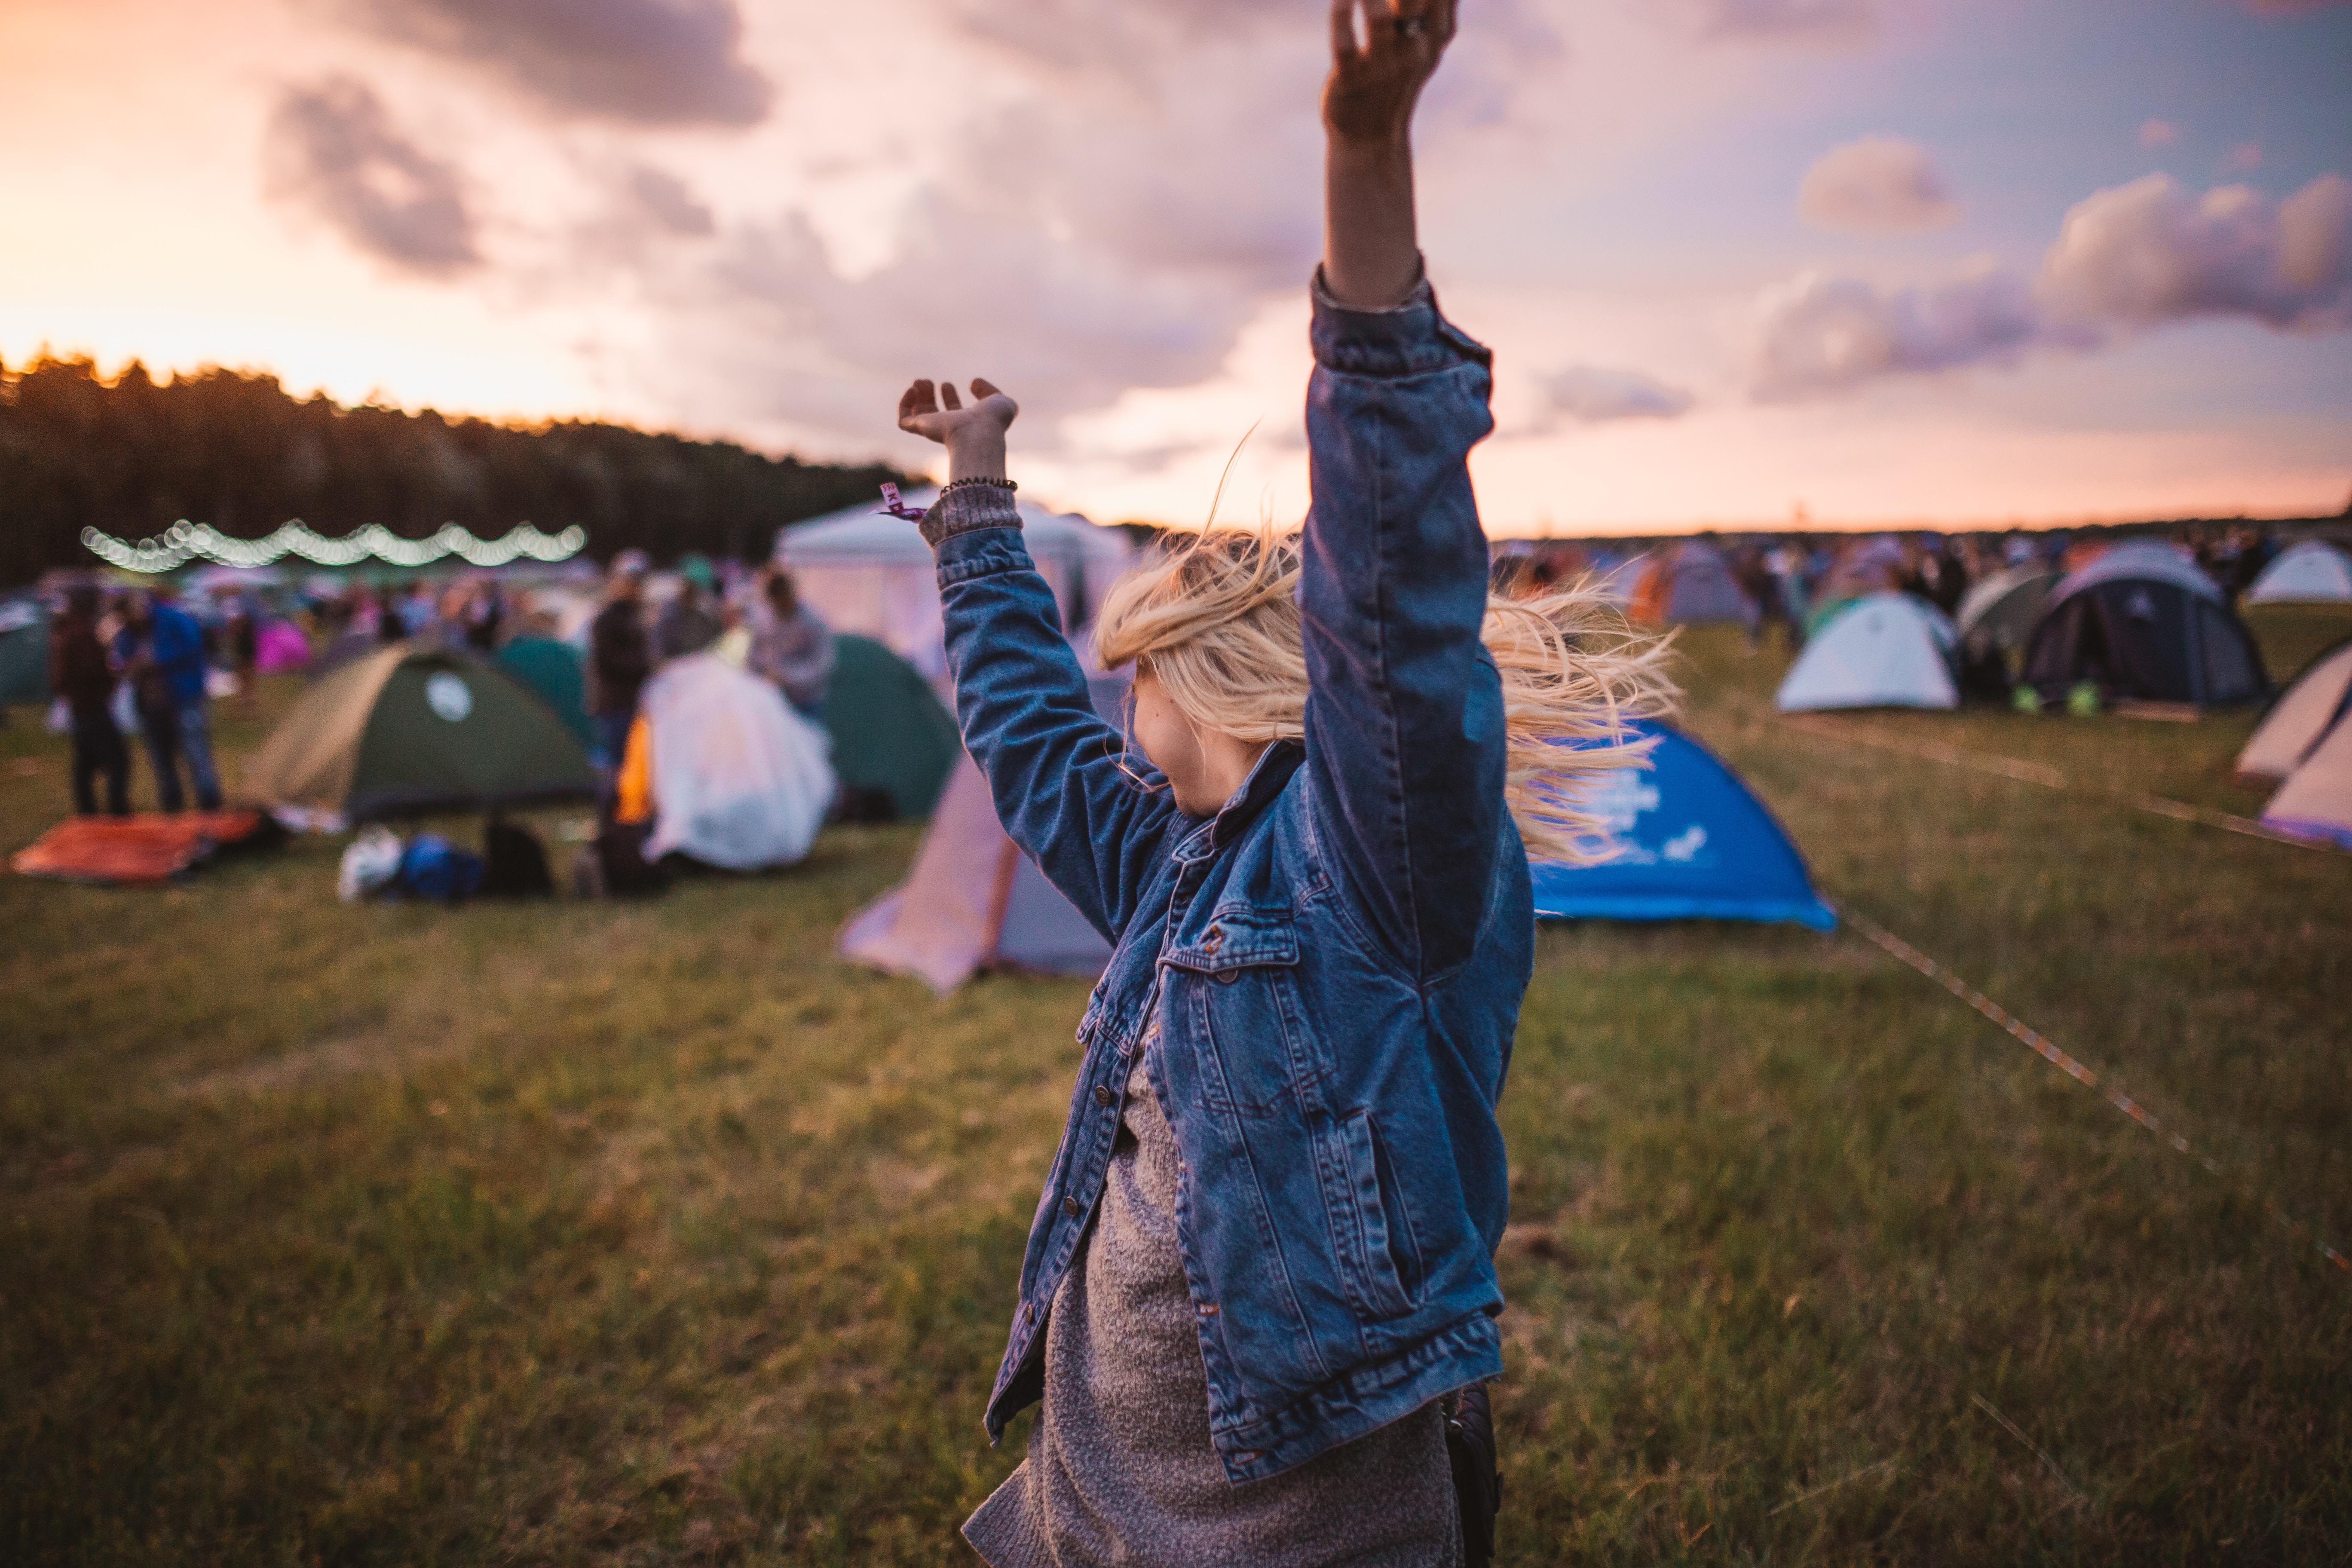 Tag vennerne med på festival